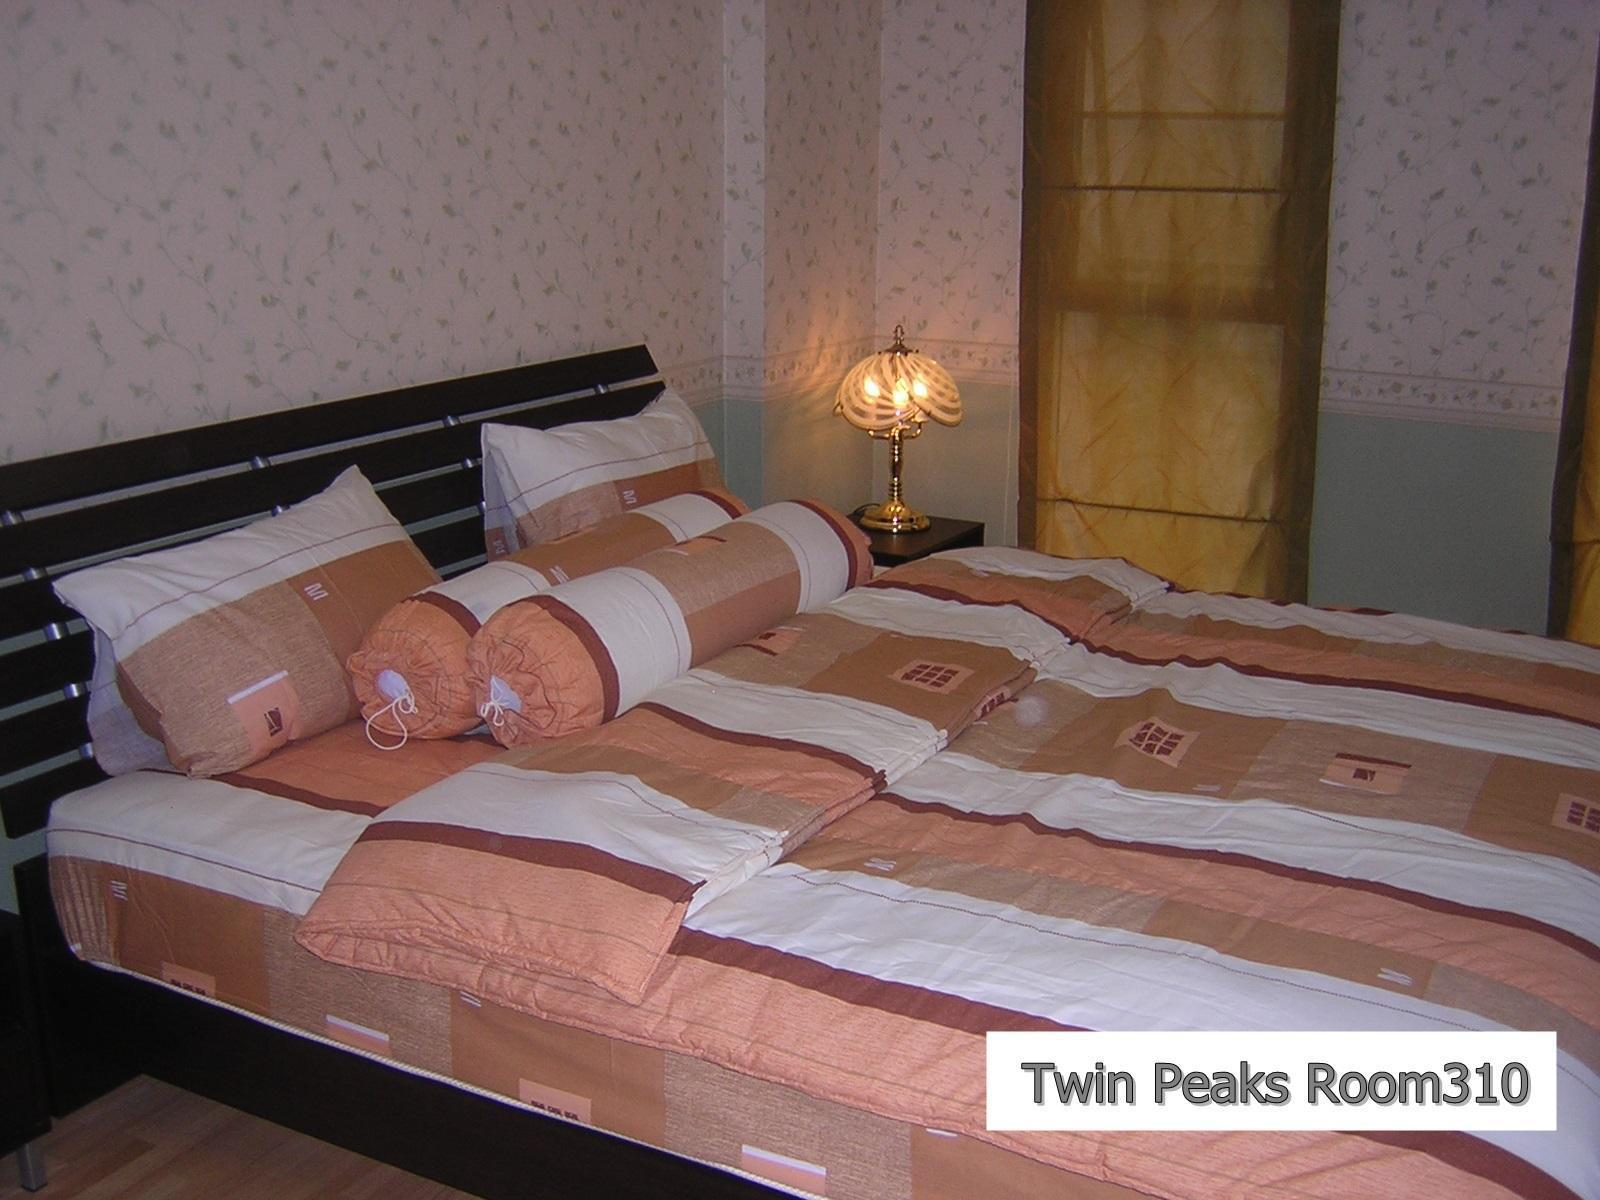 Twin Peaks Residence Room. 310 Twin Peaks Residence Room. 310